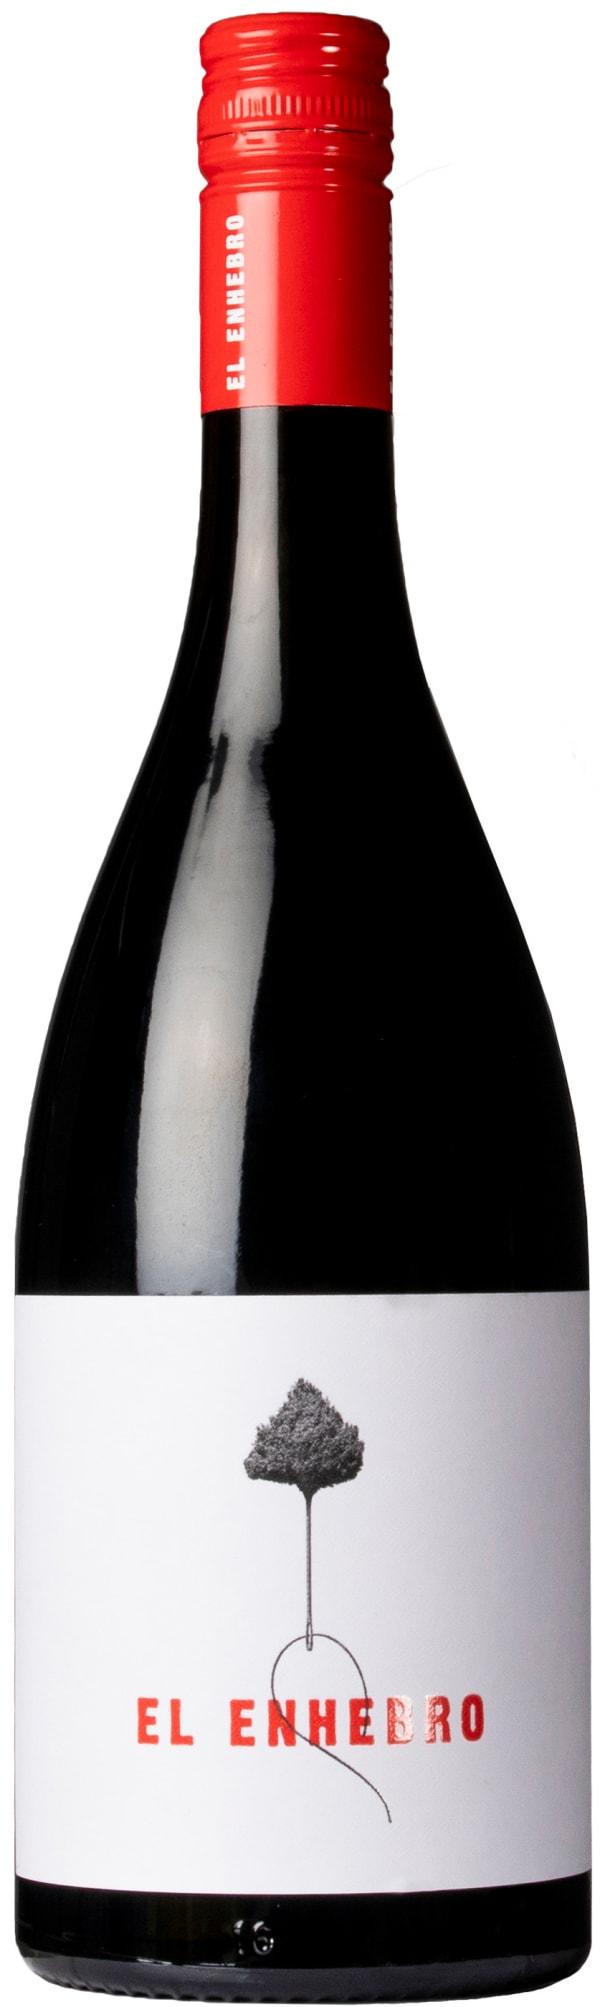 El Enhebro Monastrell Garnacha Tintorera 2016